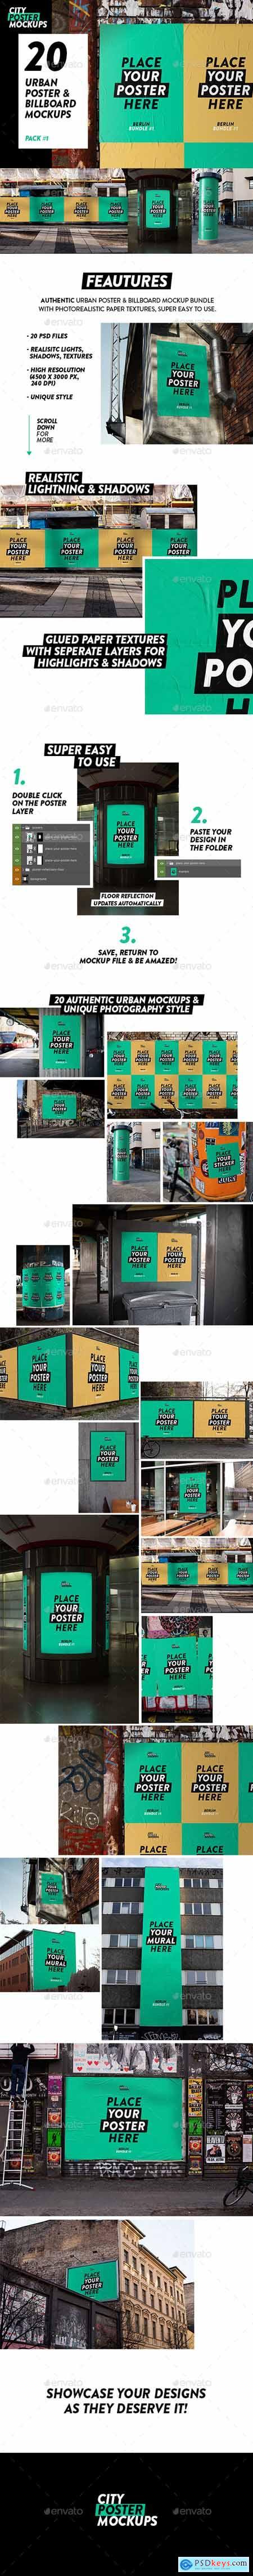 Urban Poster & Billboard Mockup Pack 25623162